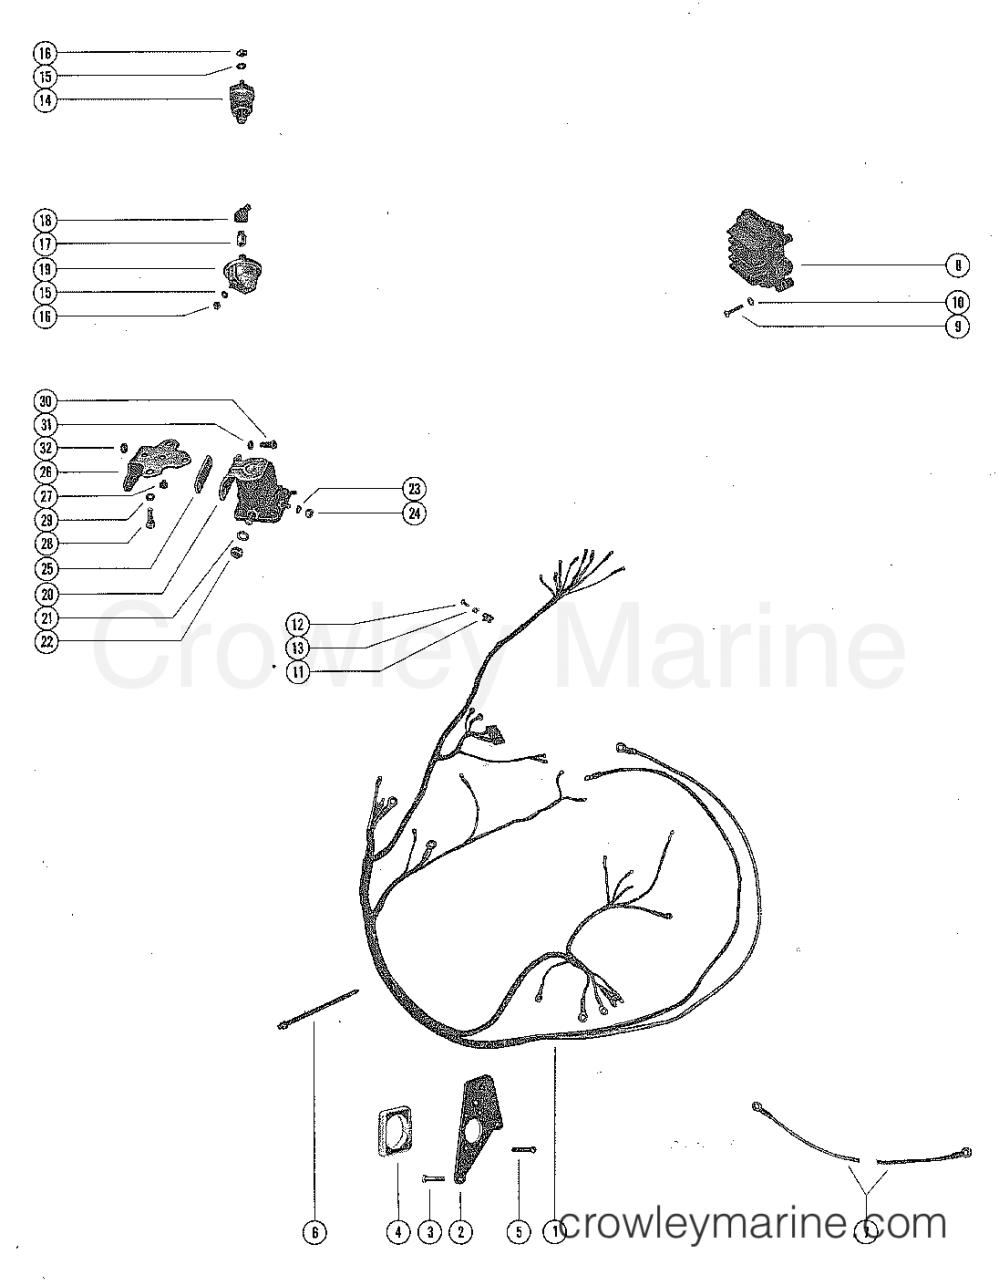 medium resolution of serial range mercruiser 160 gm 250 i l6 1967 1969 2048022 thru 2770031